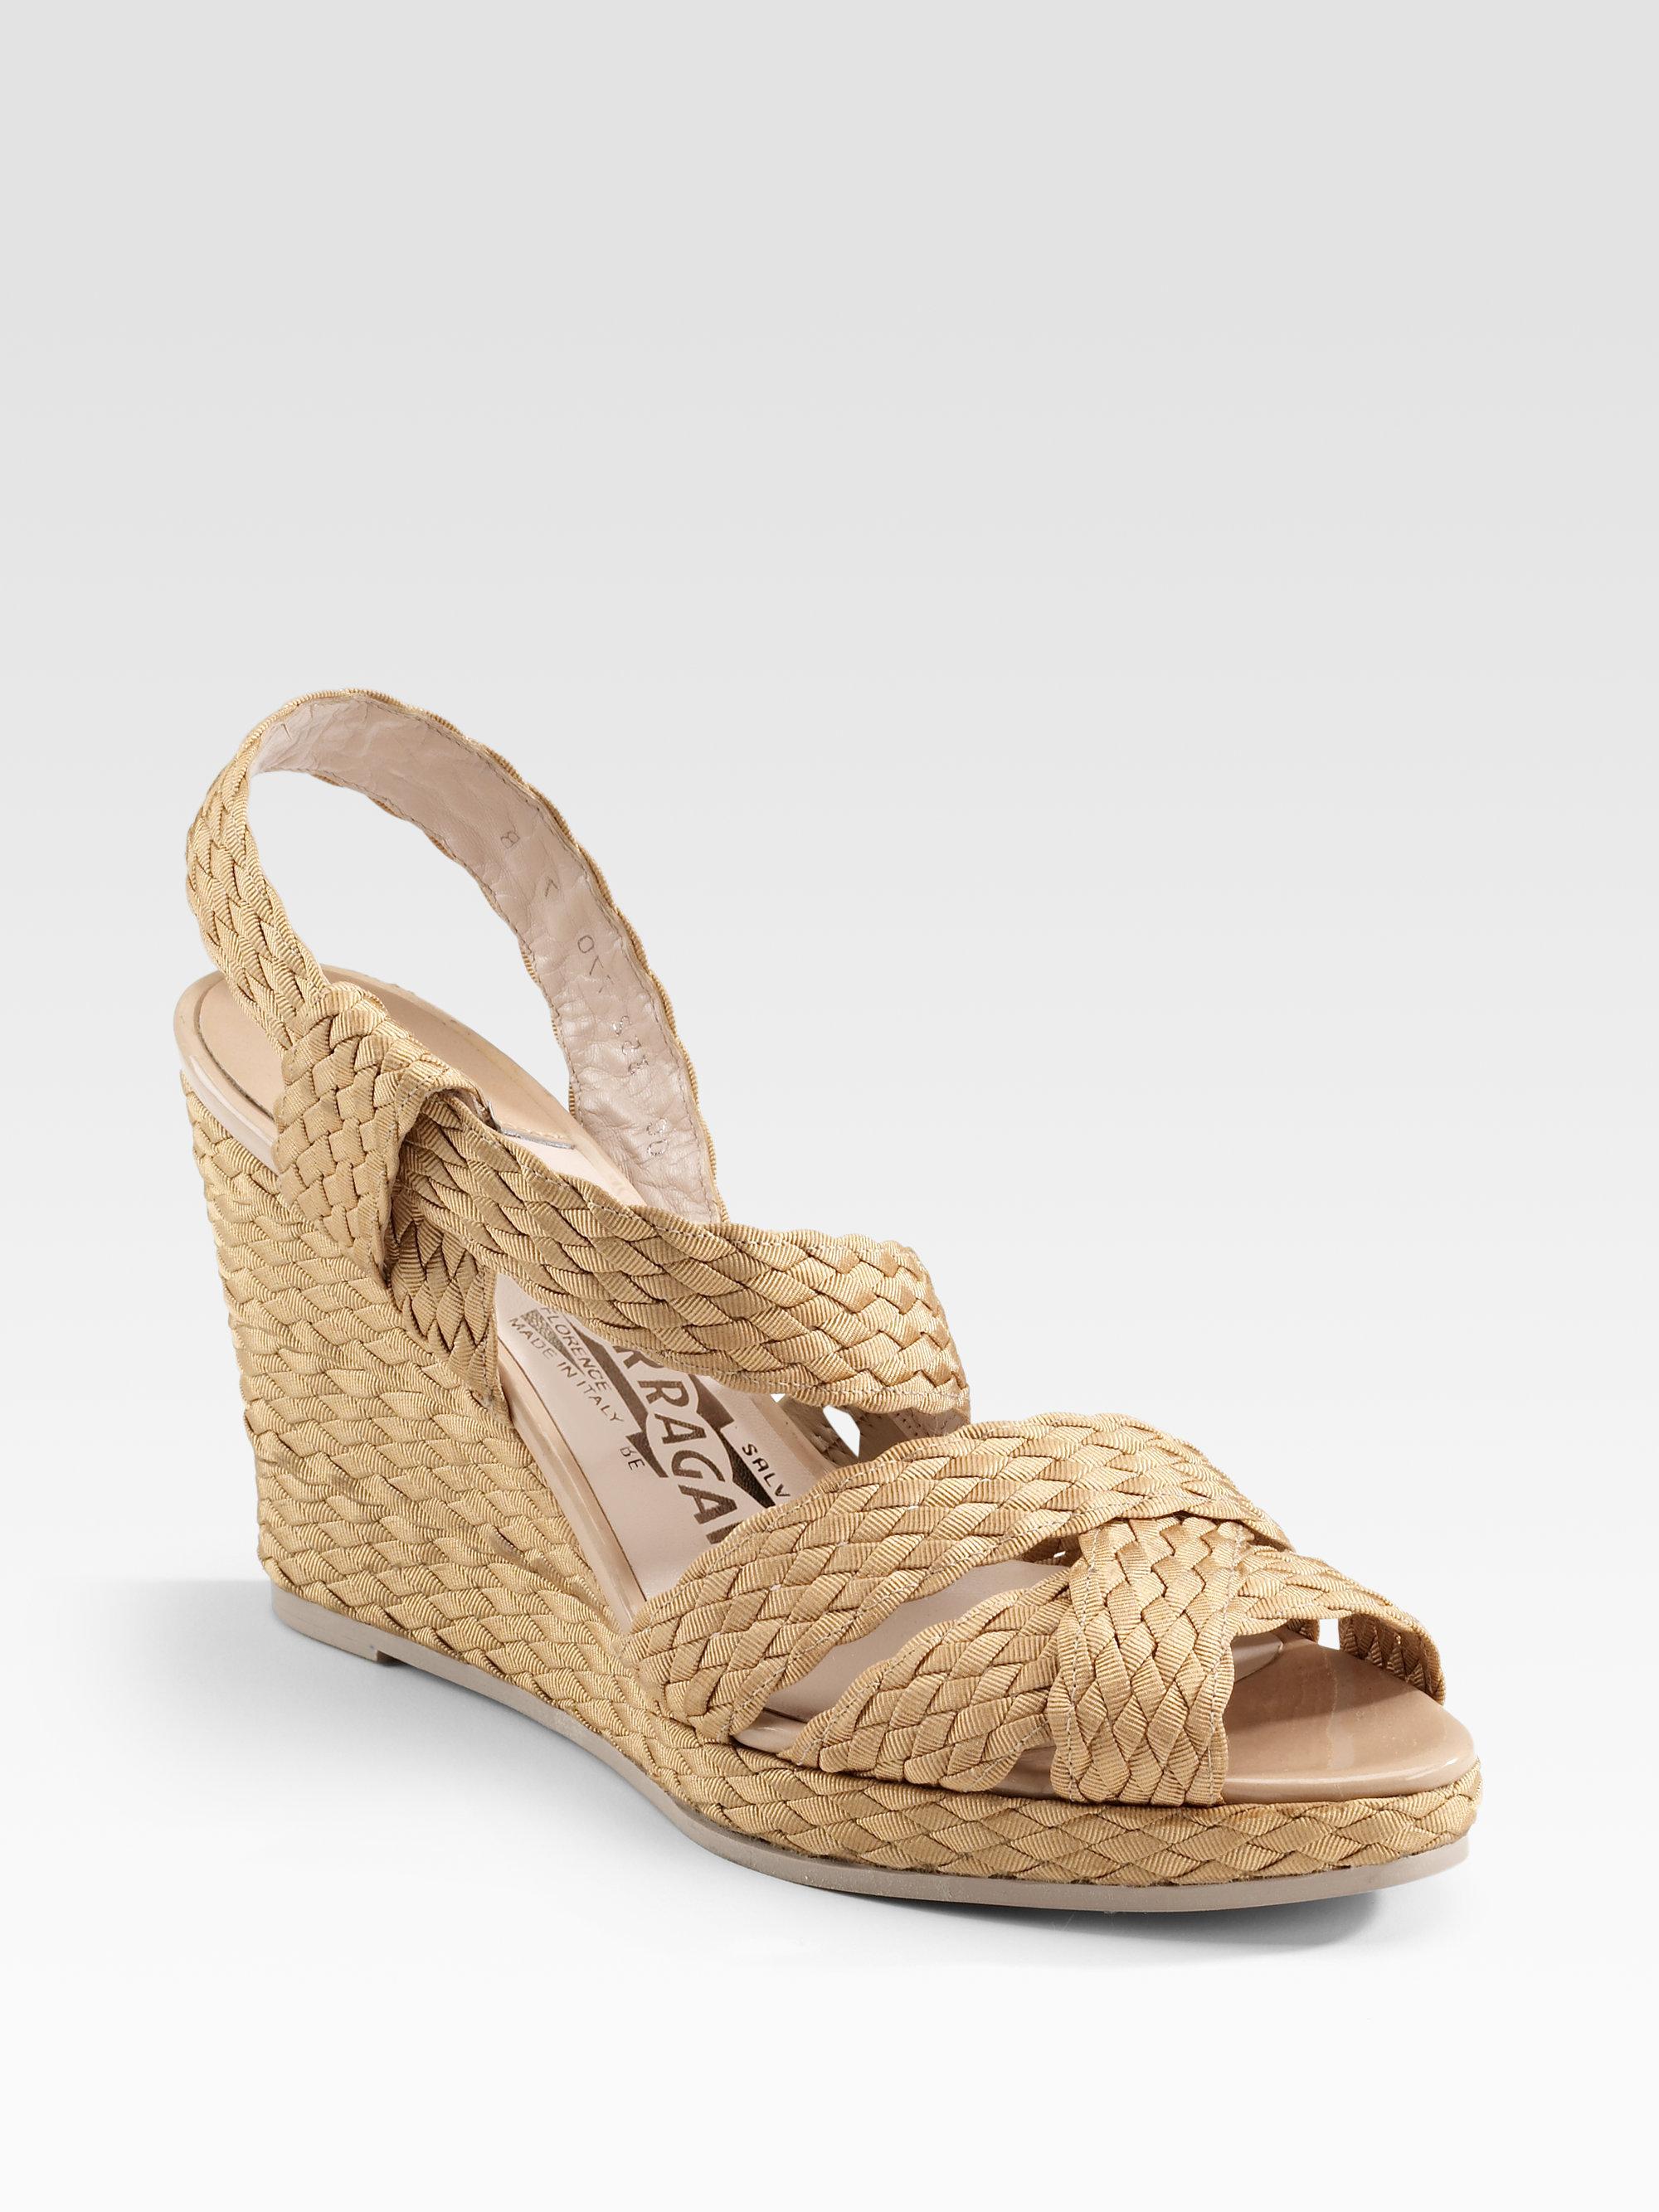 Ferragamo Dulcinea Crochet Wedge Sandals In Natural Lyst